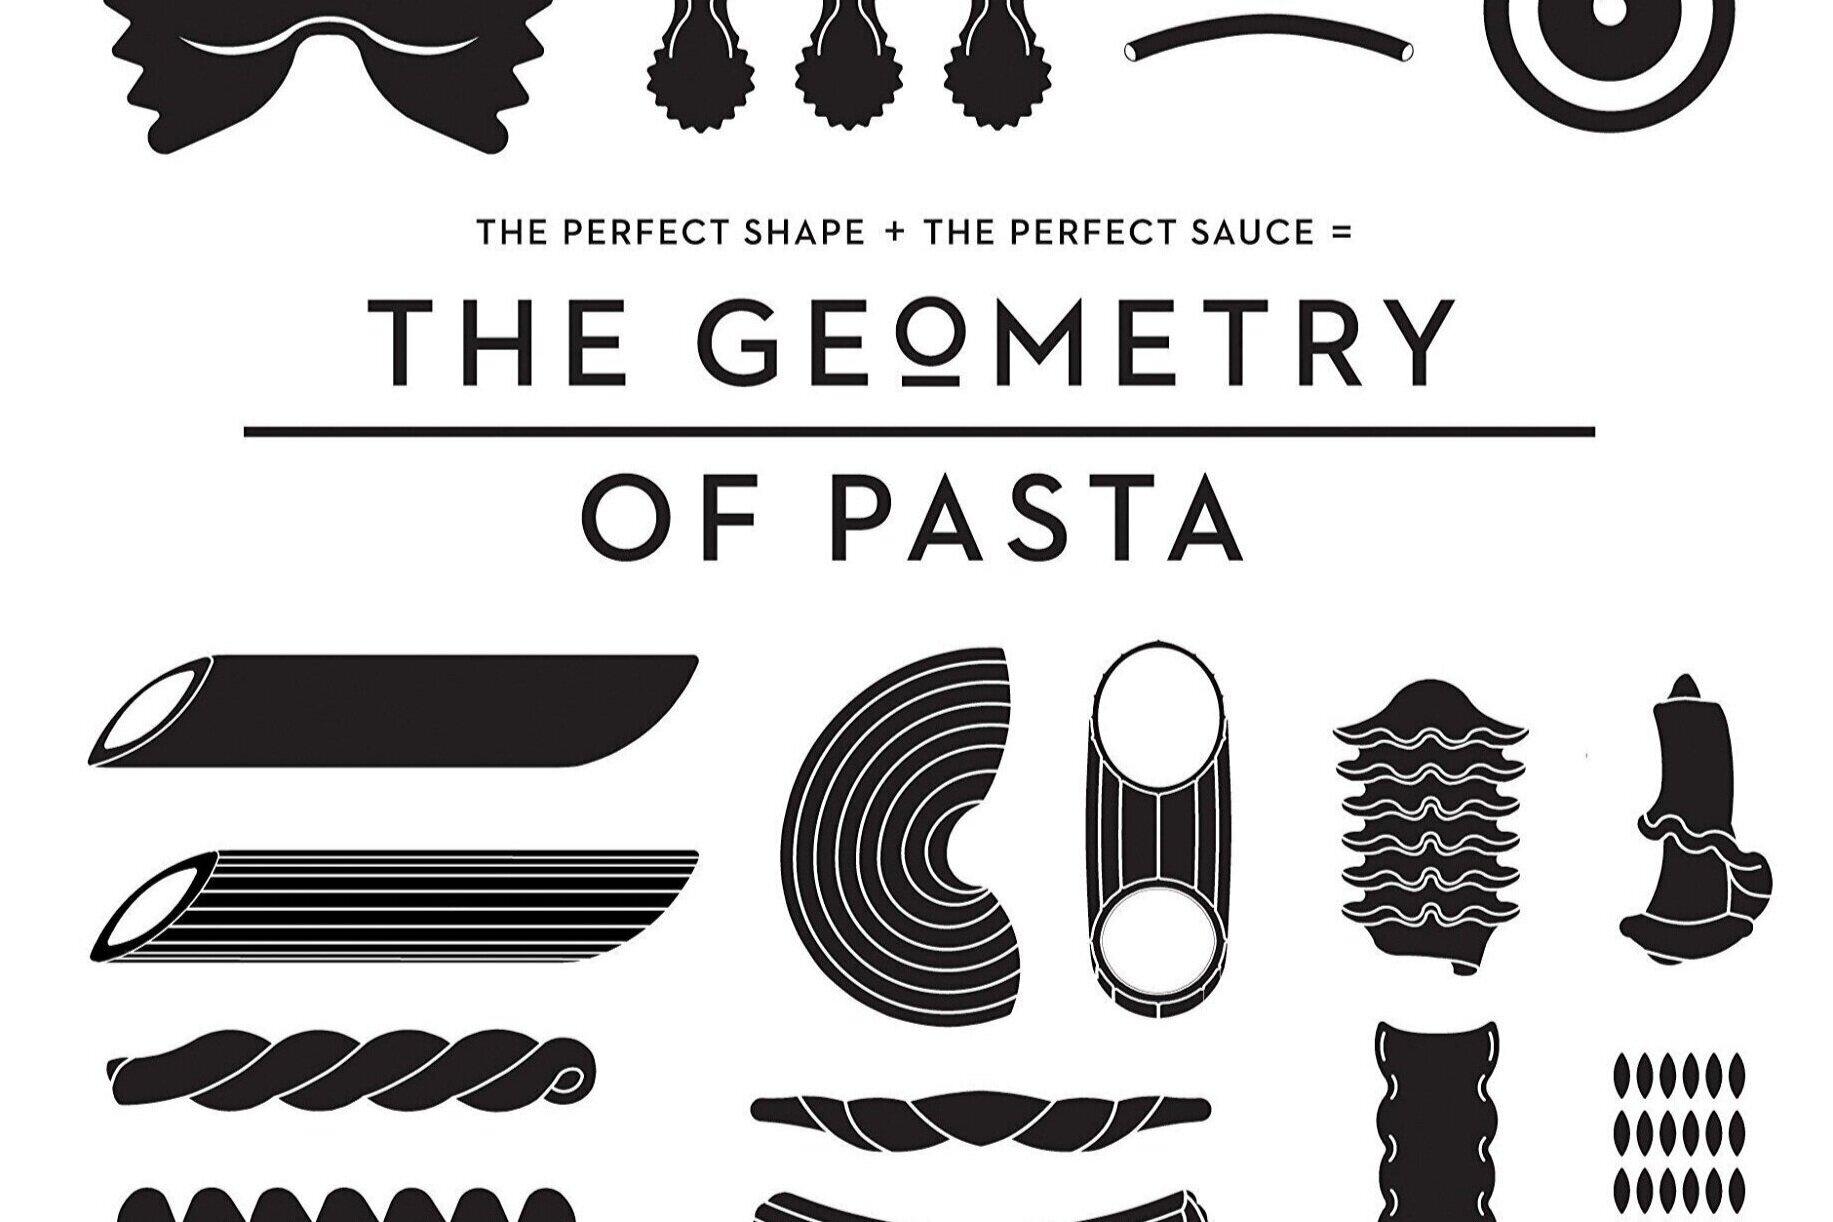 TheGeometryofPasta+copy.jpg